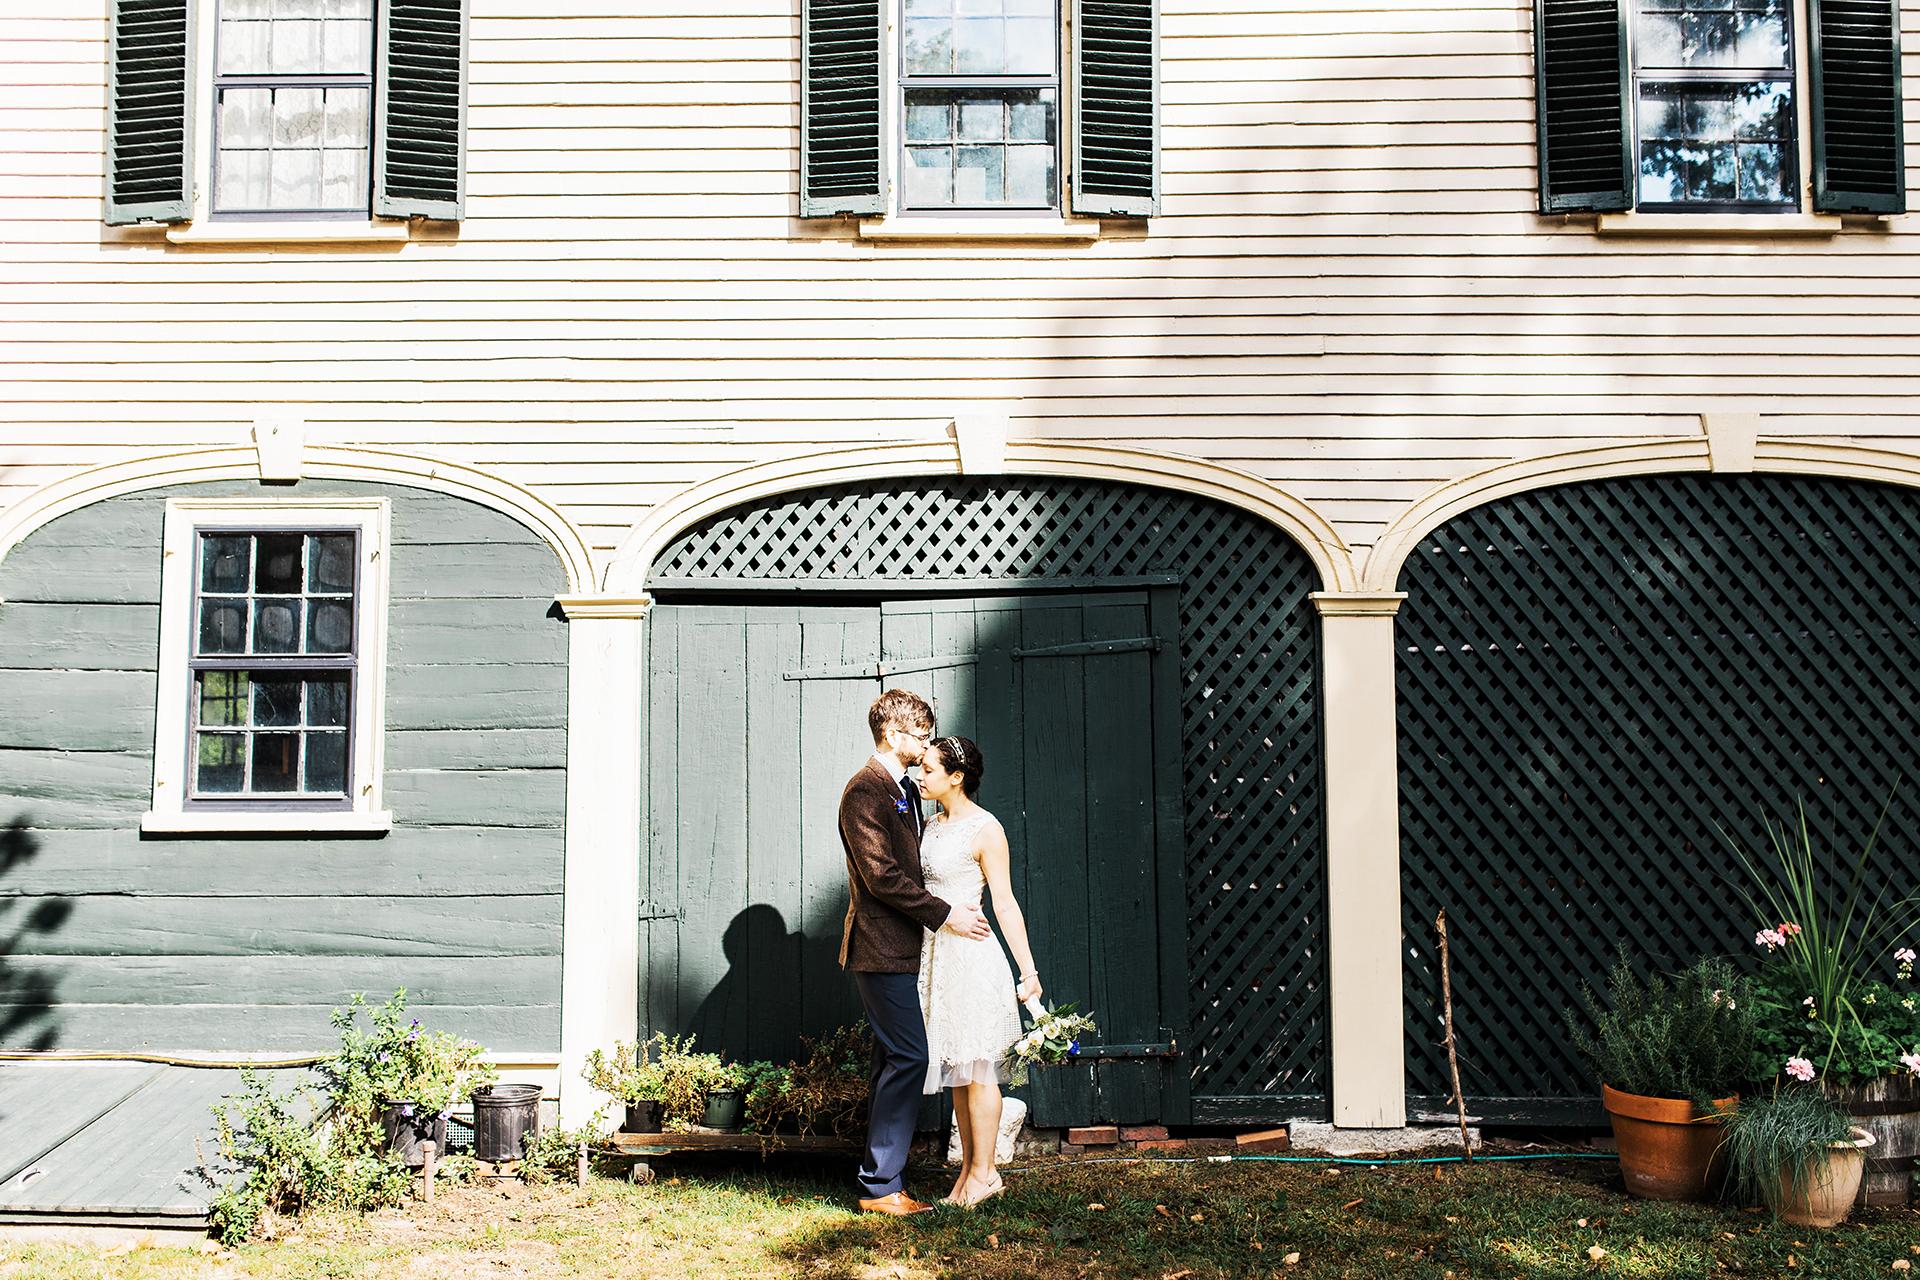 Outdoor Wedding Venues Near Boston - Loring Greenough House